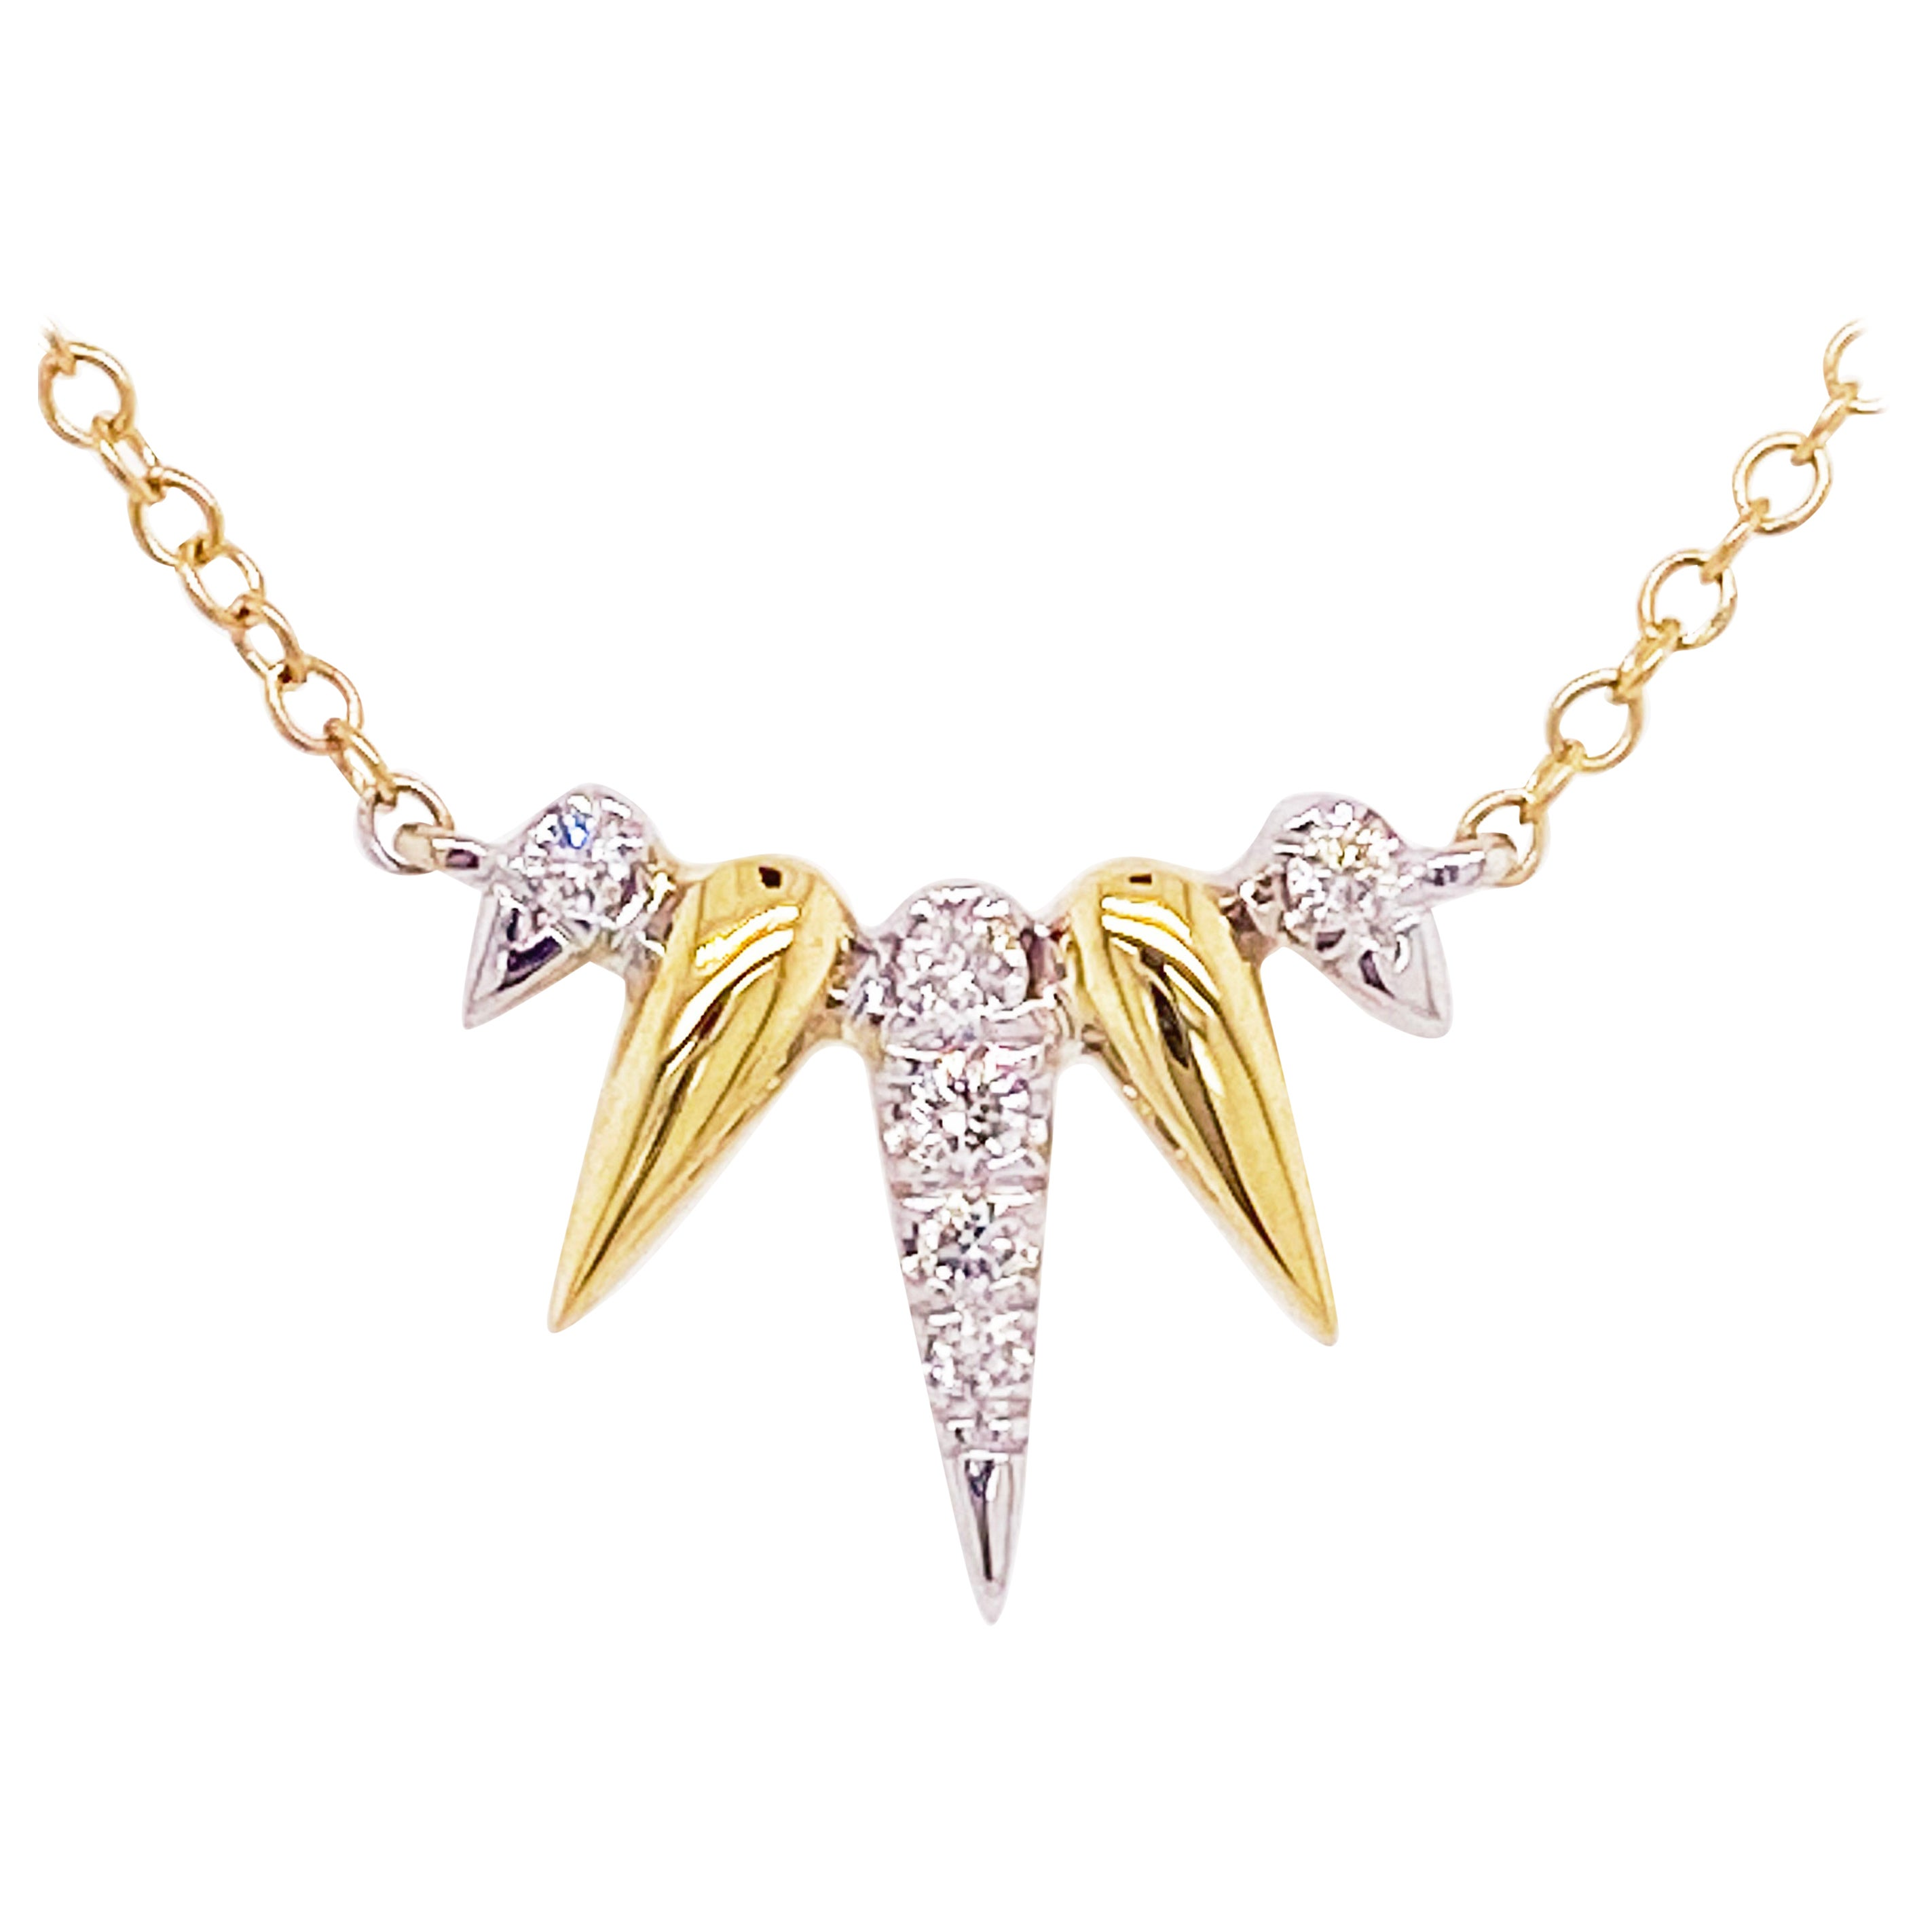 Diamond Spike Necklace, 14K Yellow-White Gold Diamond Pave Spike Fan Necklace